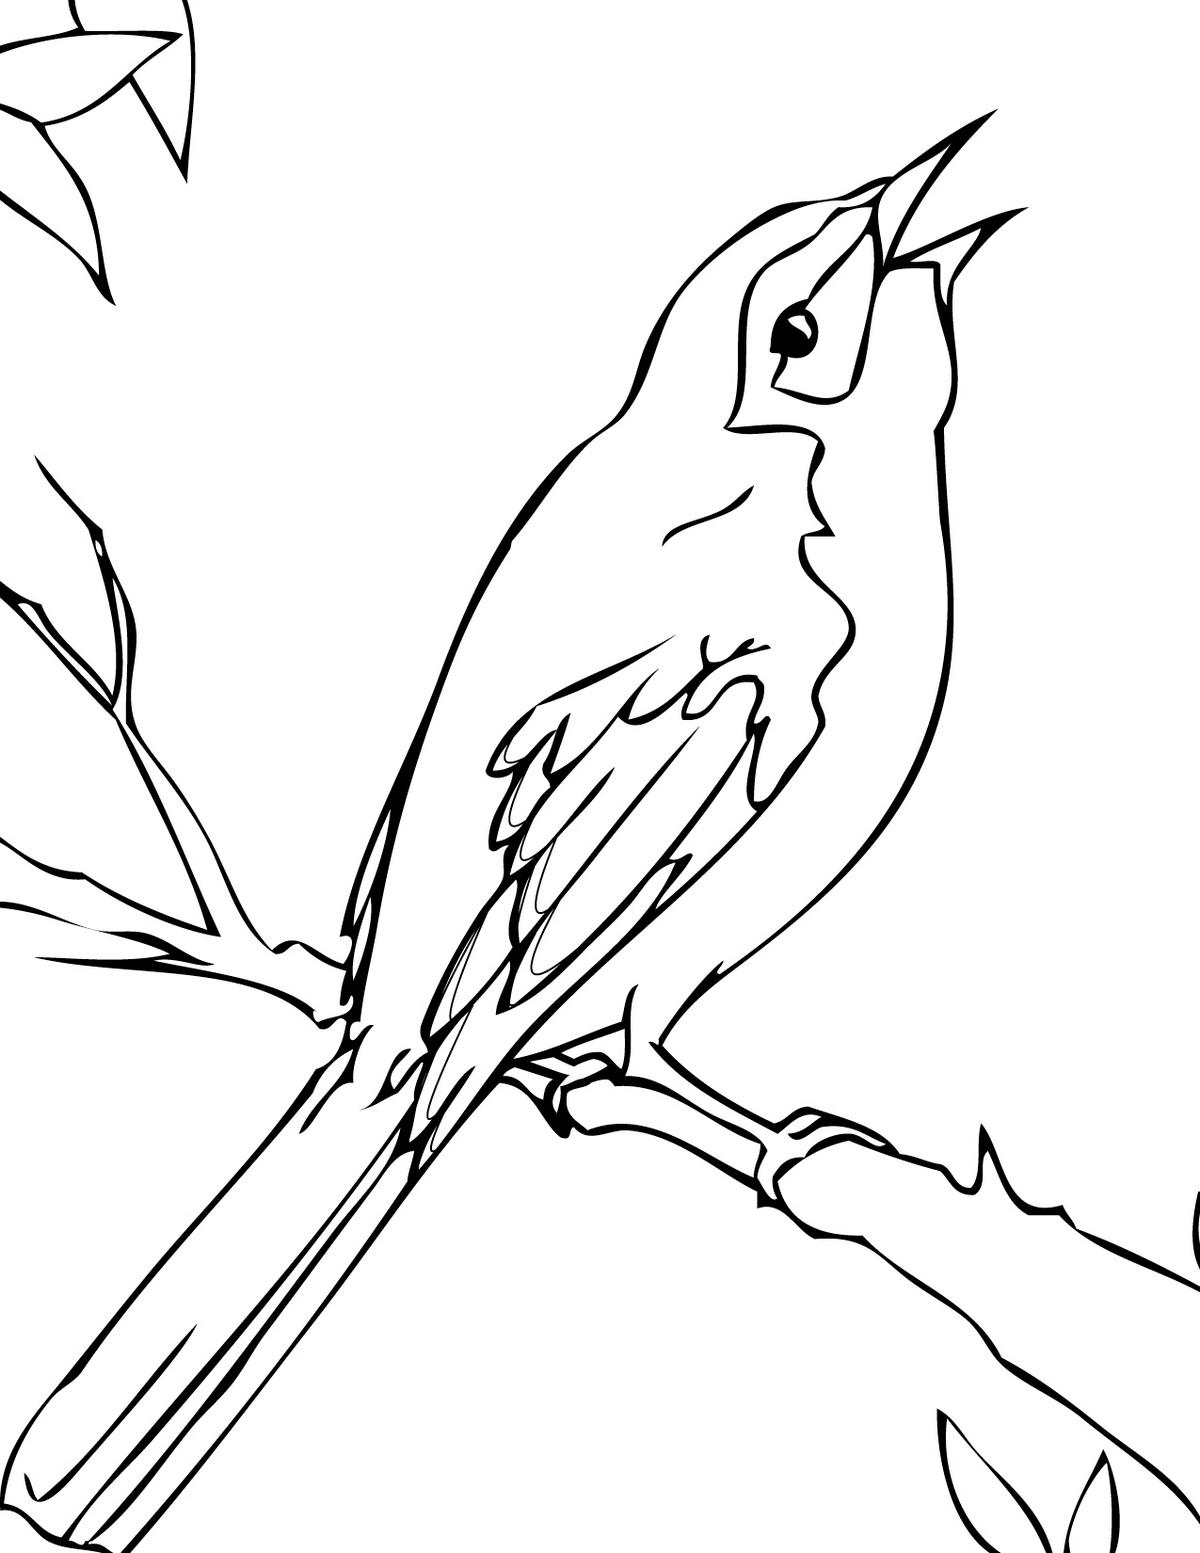 mockingbird-coloring-page-to-print